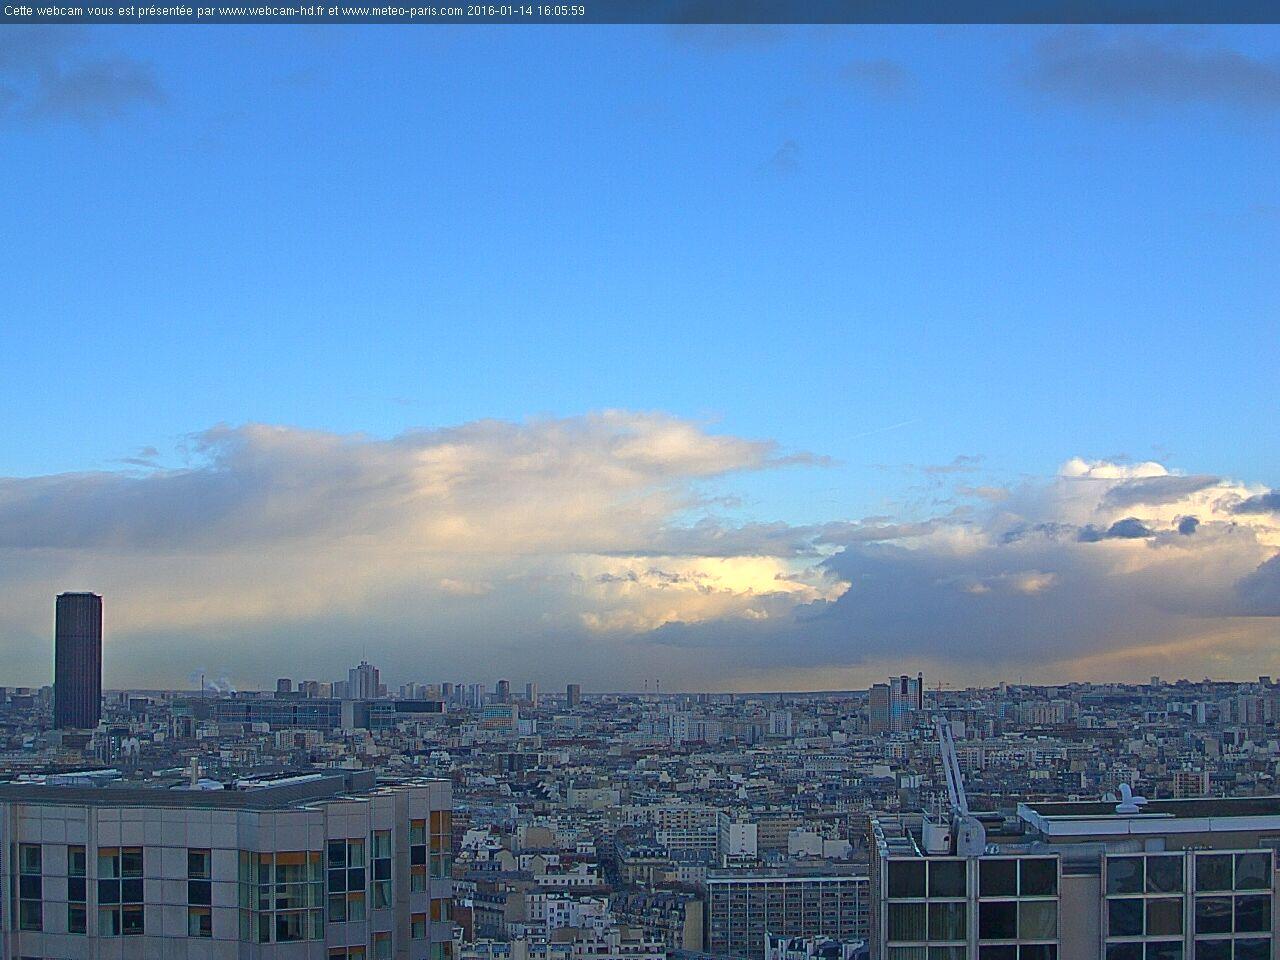 http://www.webcam-hd.fr/images/pariscam4/webcam_pariscam4_5min.jpg